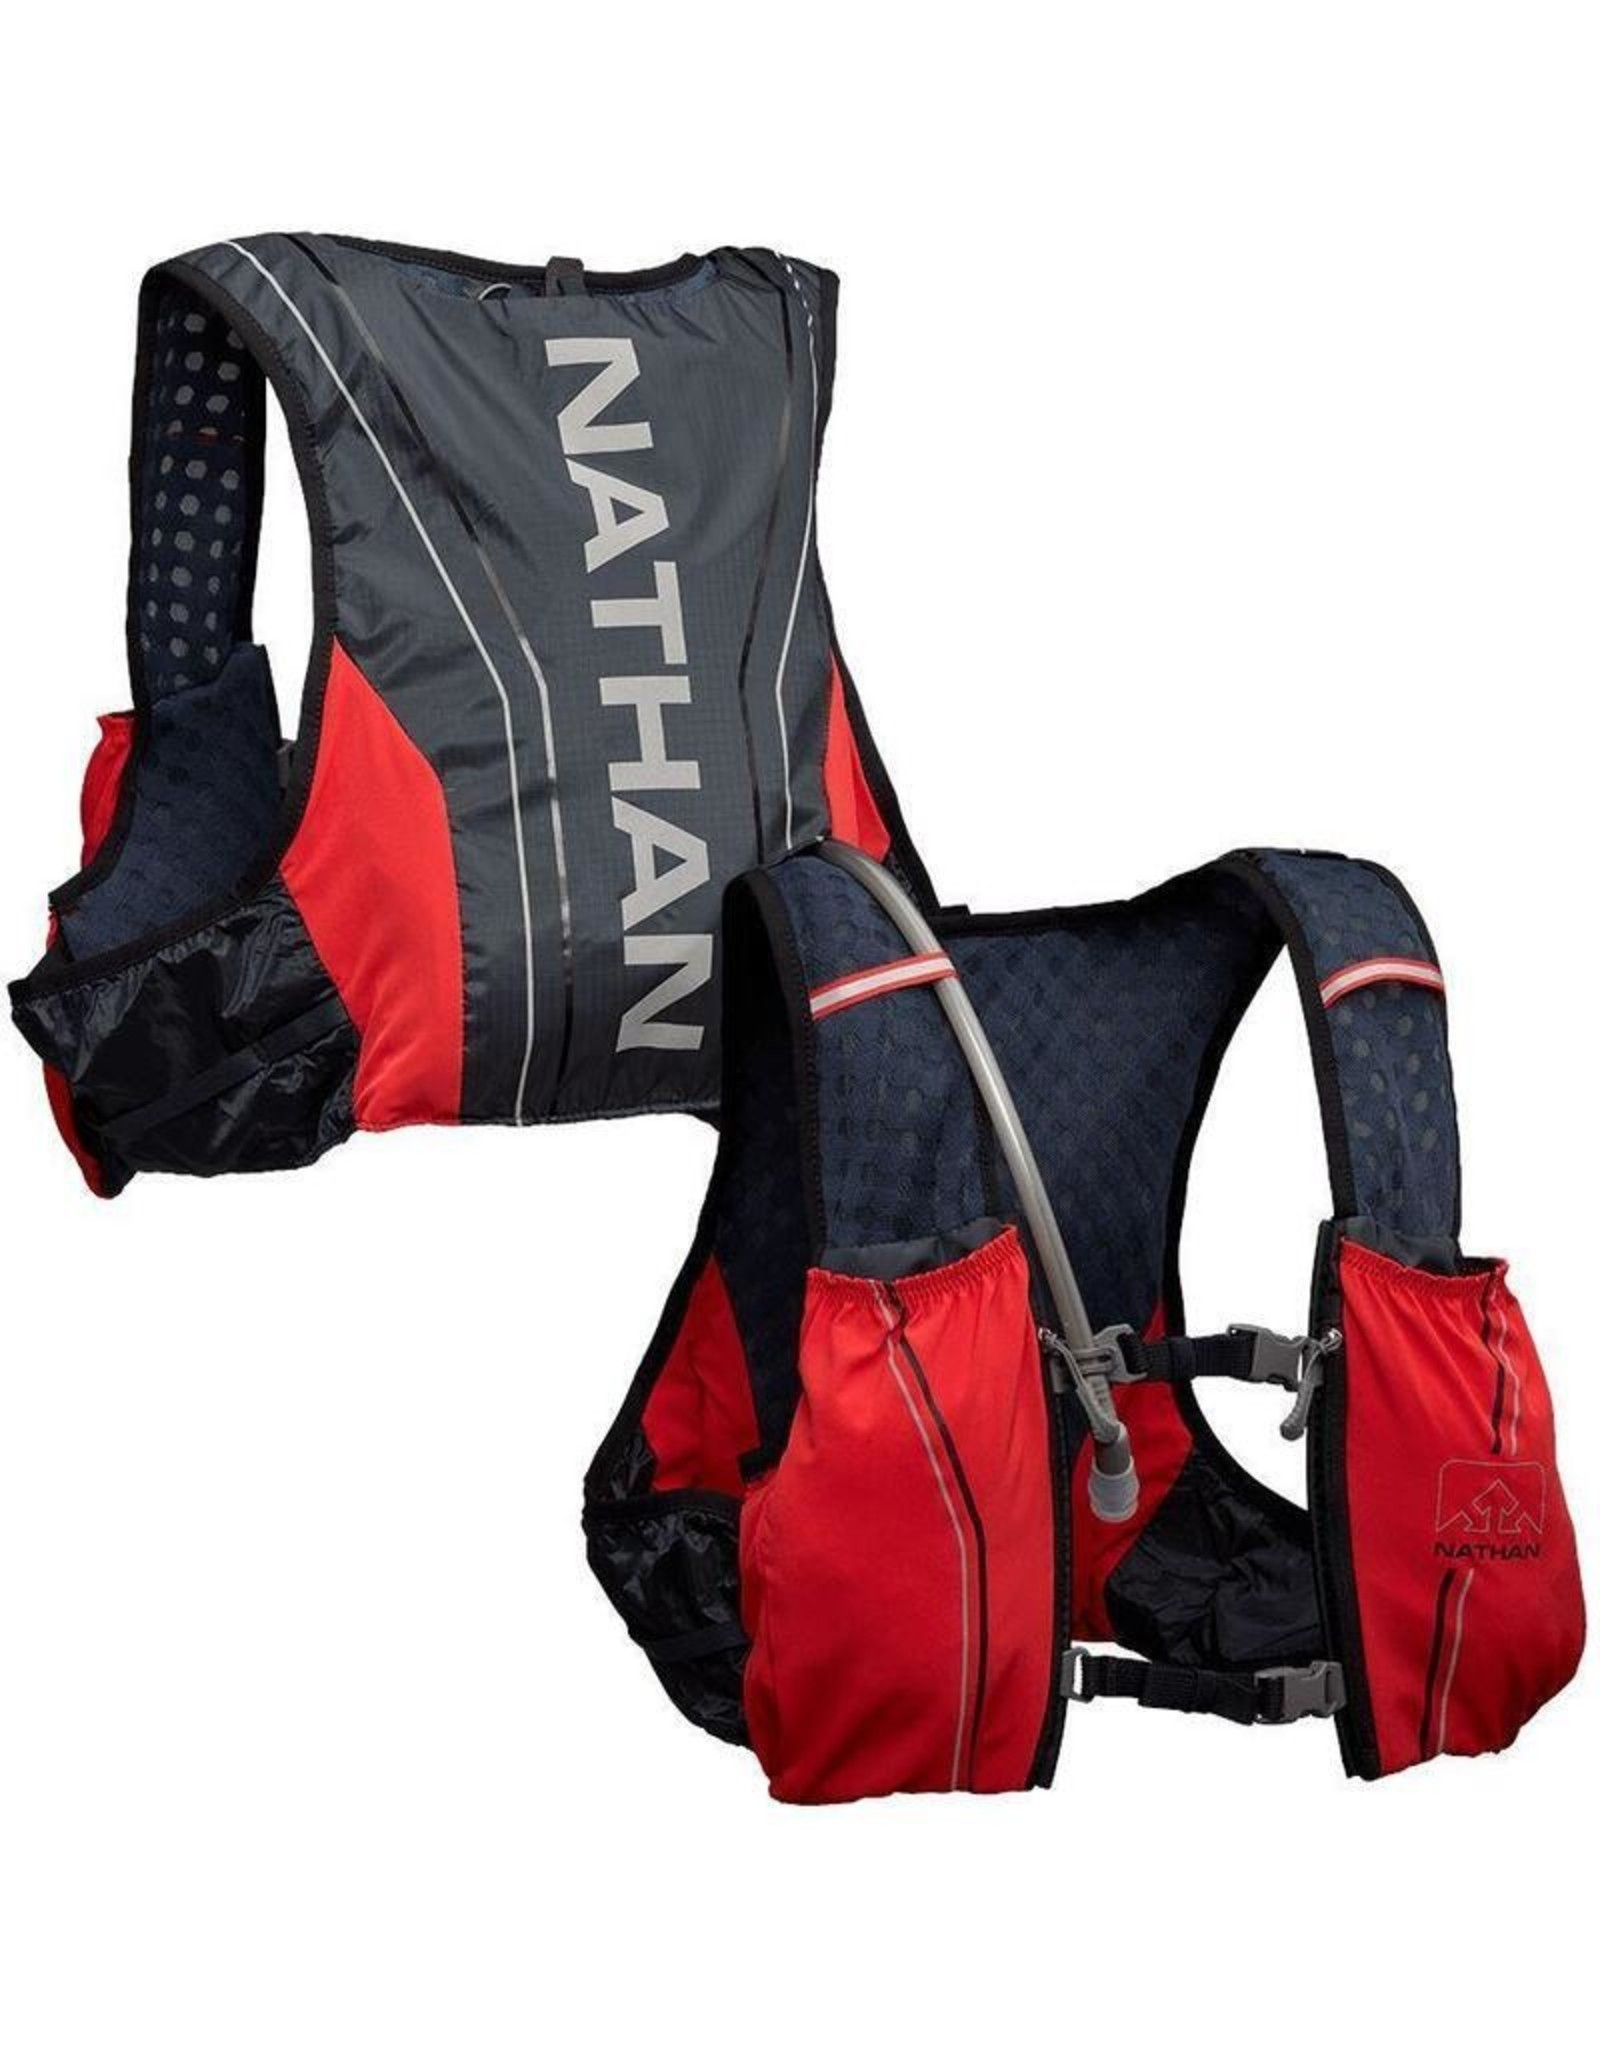 NATHAN VAPORSWIFT 4L